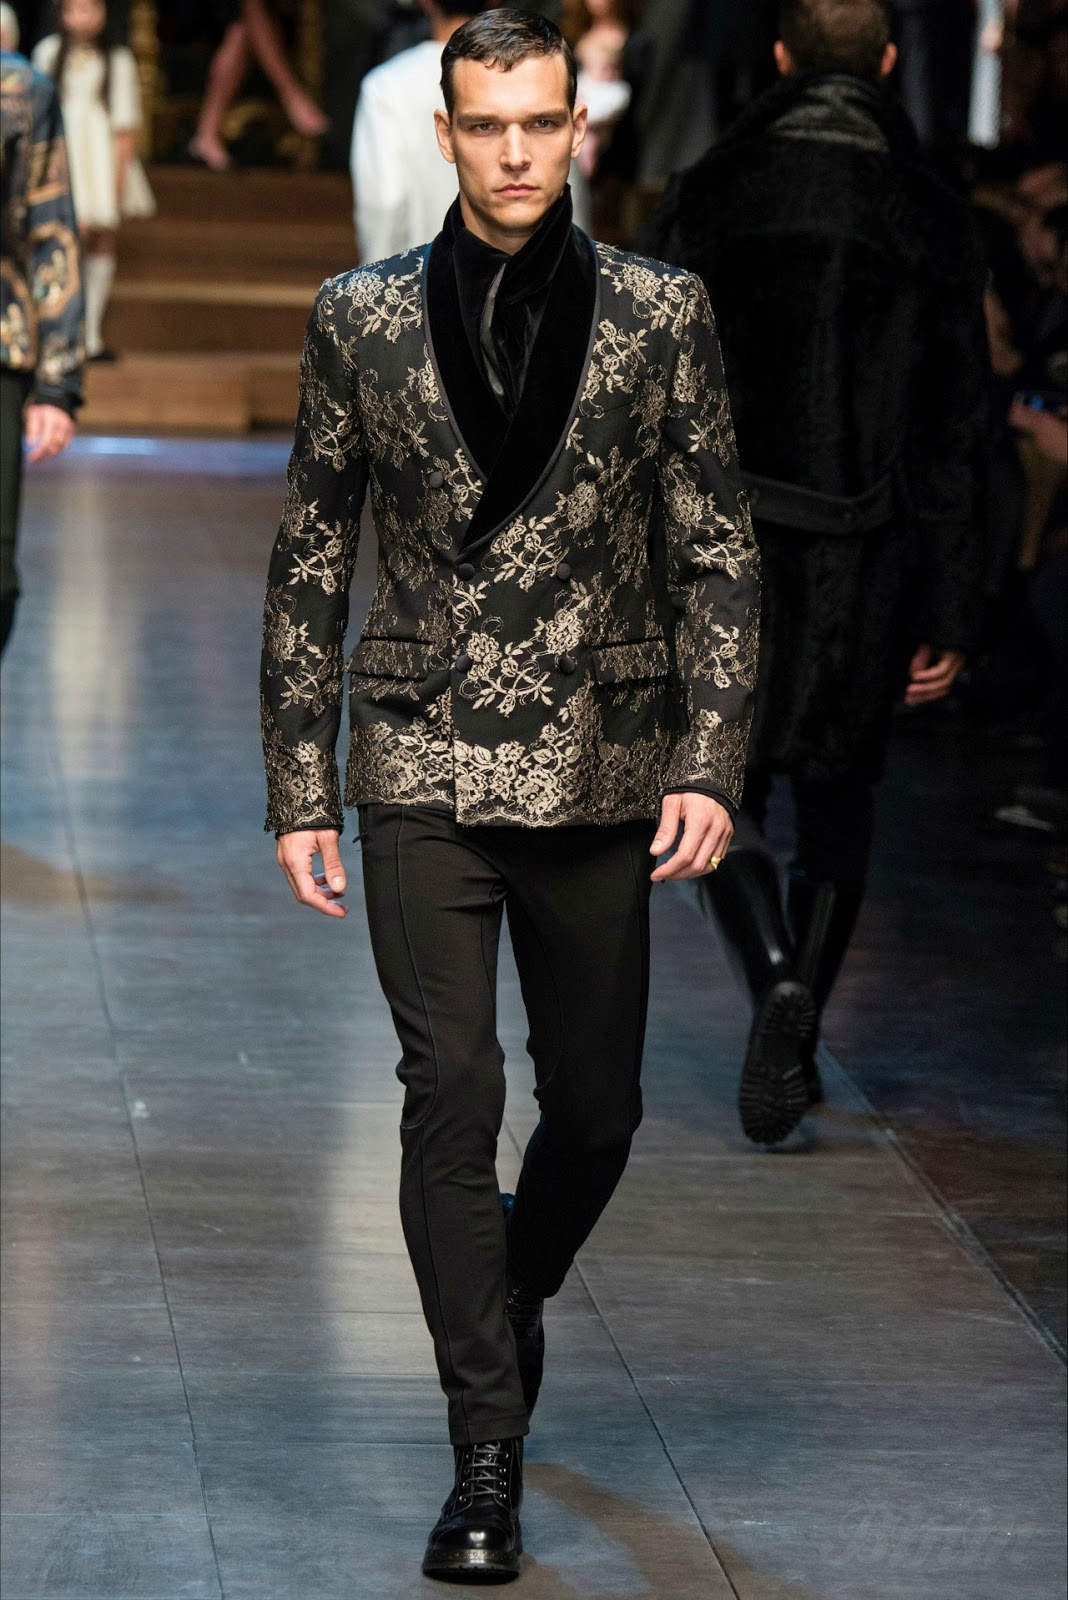 Vestiti Matrimonio Uomo Dolce Gabbana : Dolce gabbana fall winter brazil male models